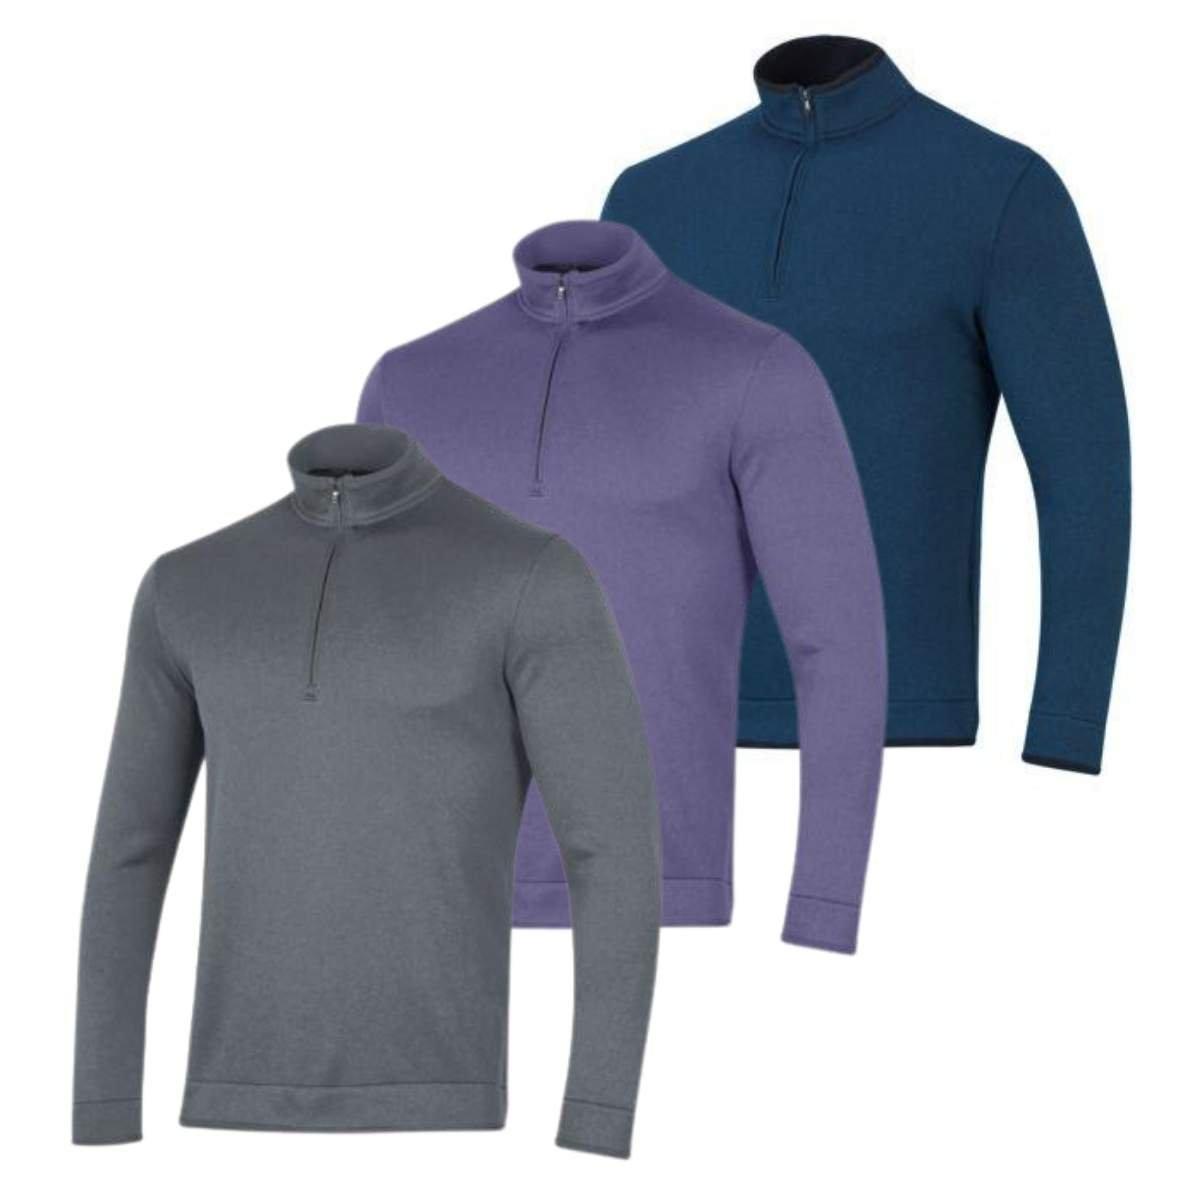 Under Armour Men's 2021 Storm Speckled Sweater Fleece